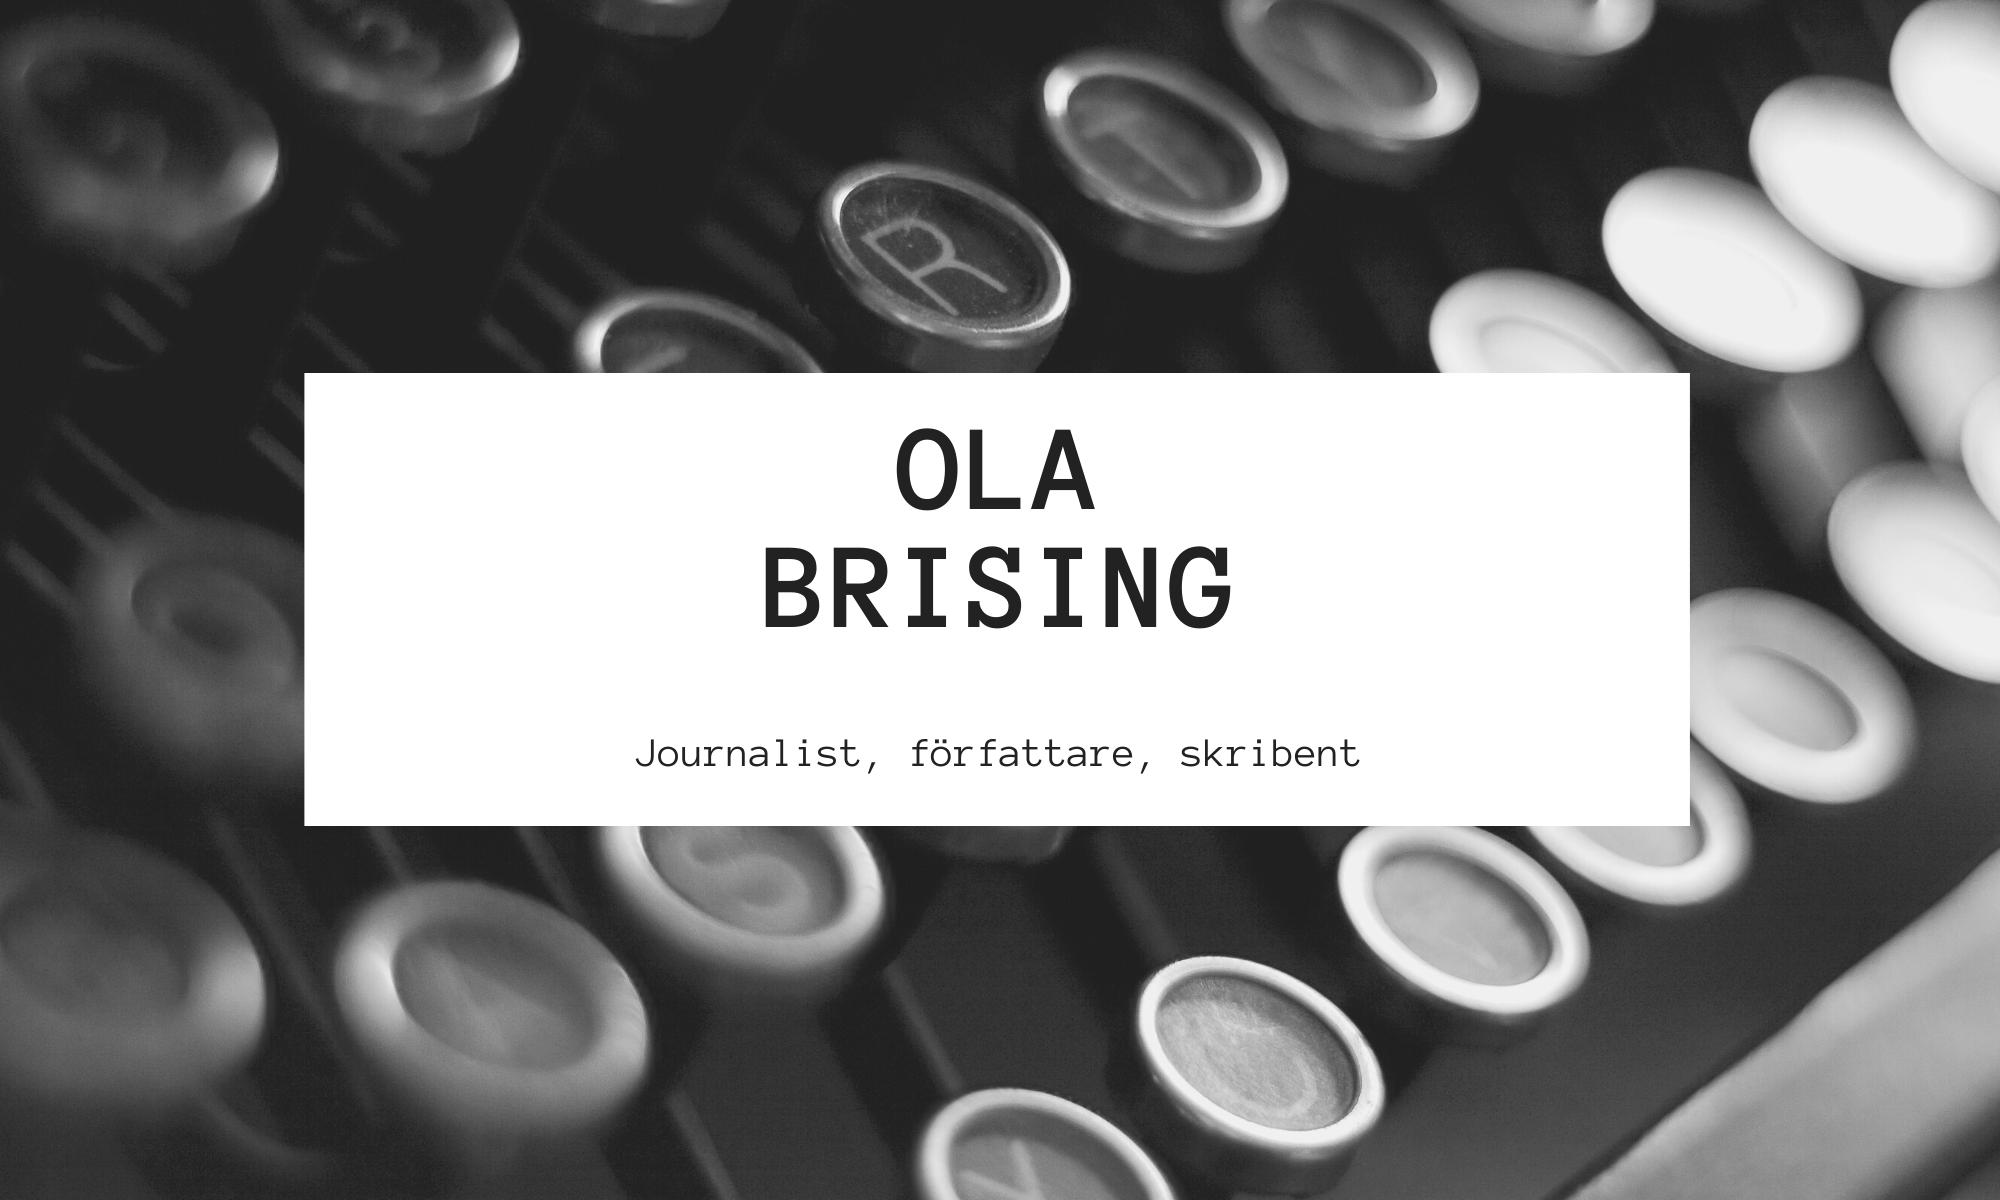 Ola Brising